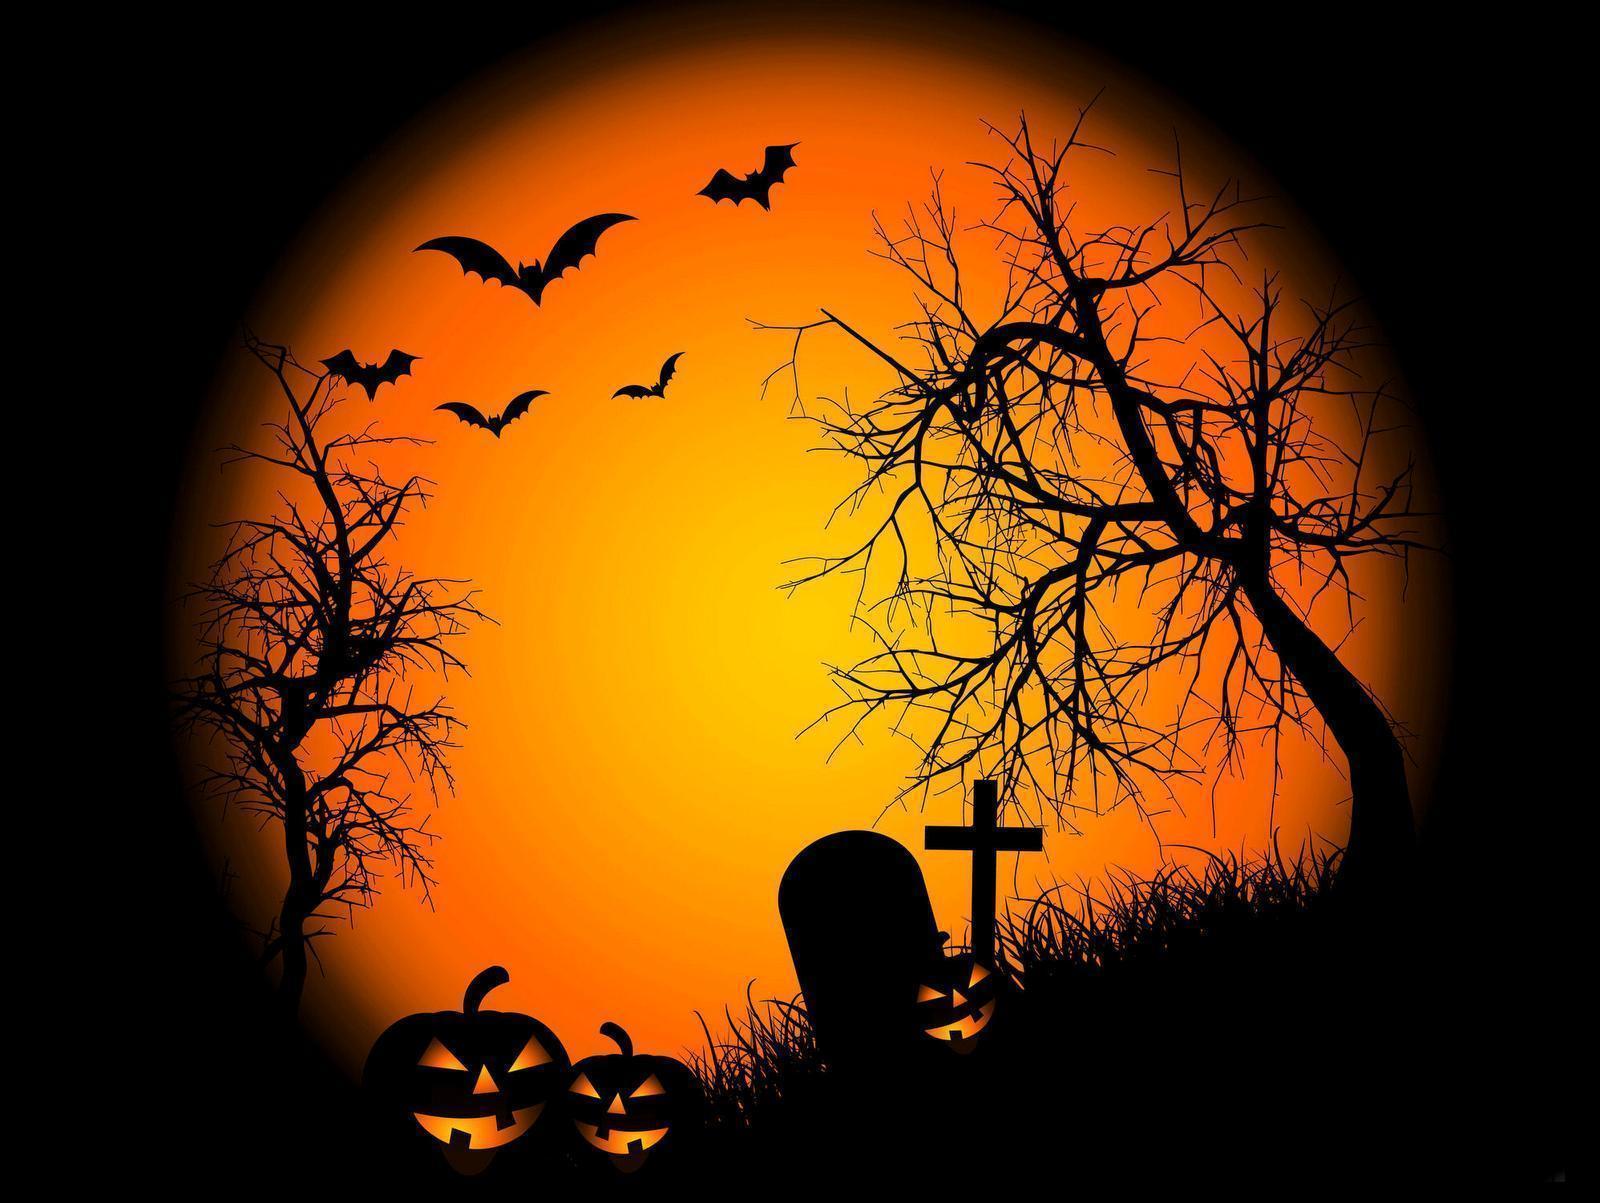 Hd halloween desktop backgrounds wallpaper cave - Free widescreen halloween wallpaper ...